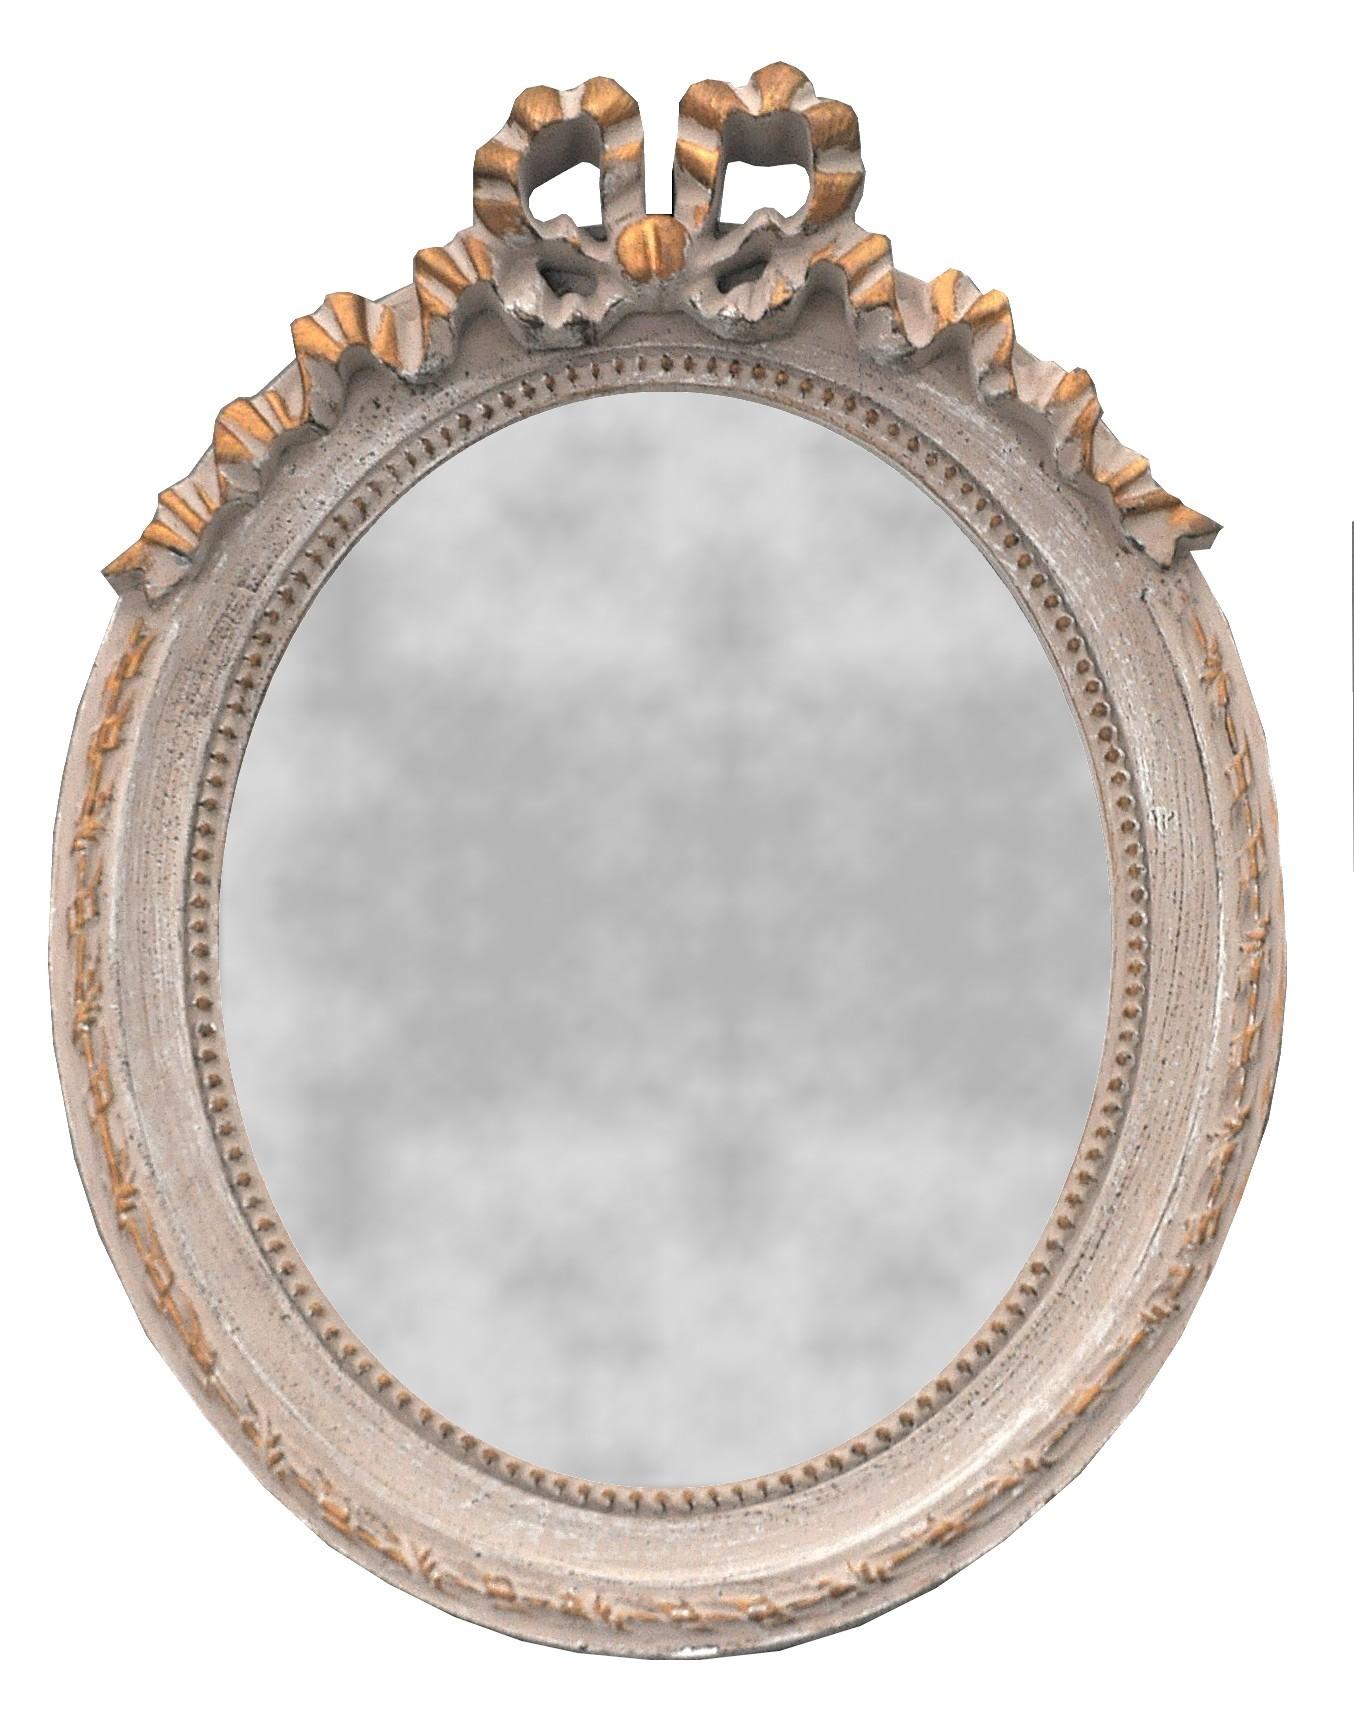 Petit miroir oval style louis xvi 27 x 35 cm demeure Petit miroir decoratif